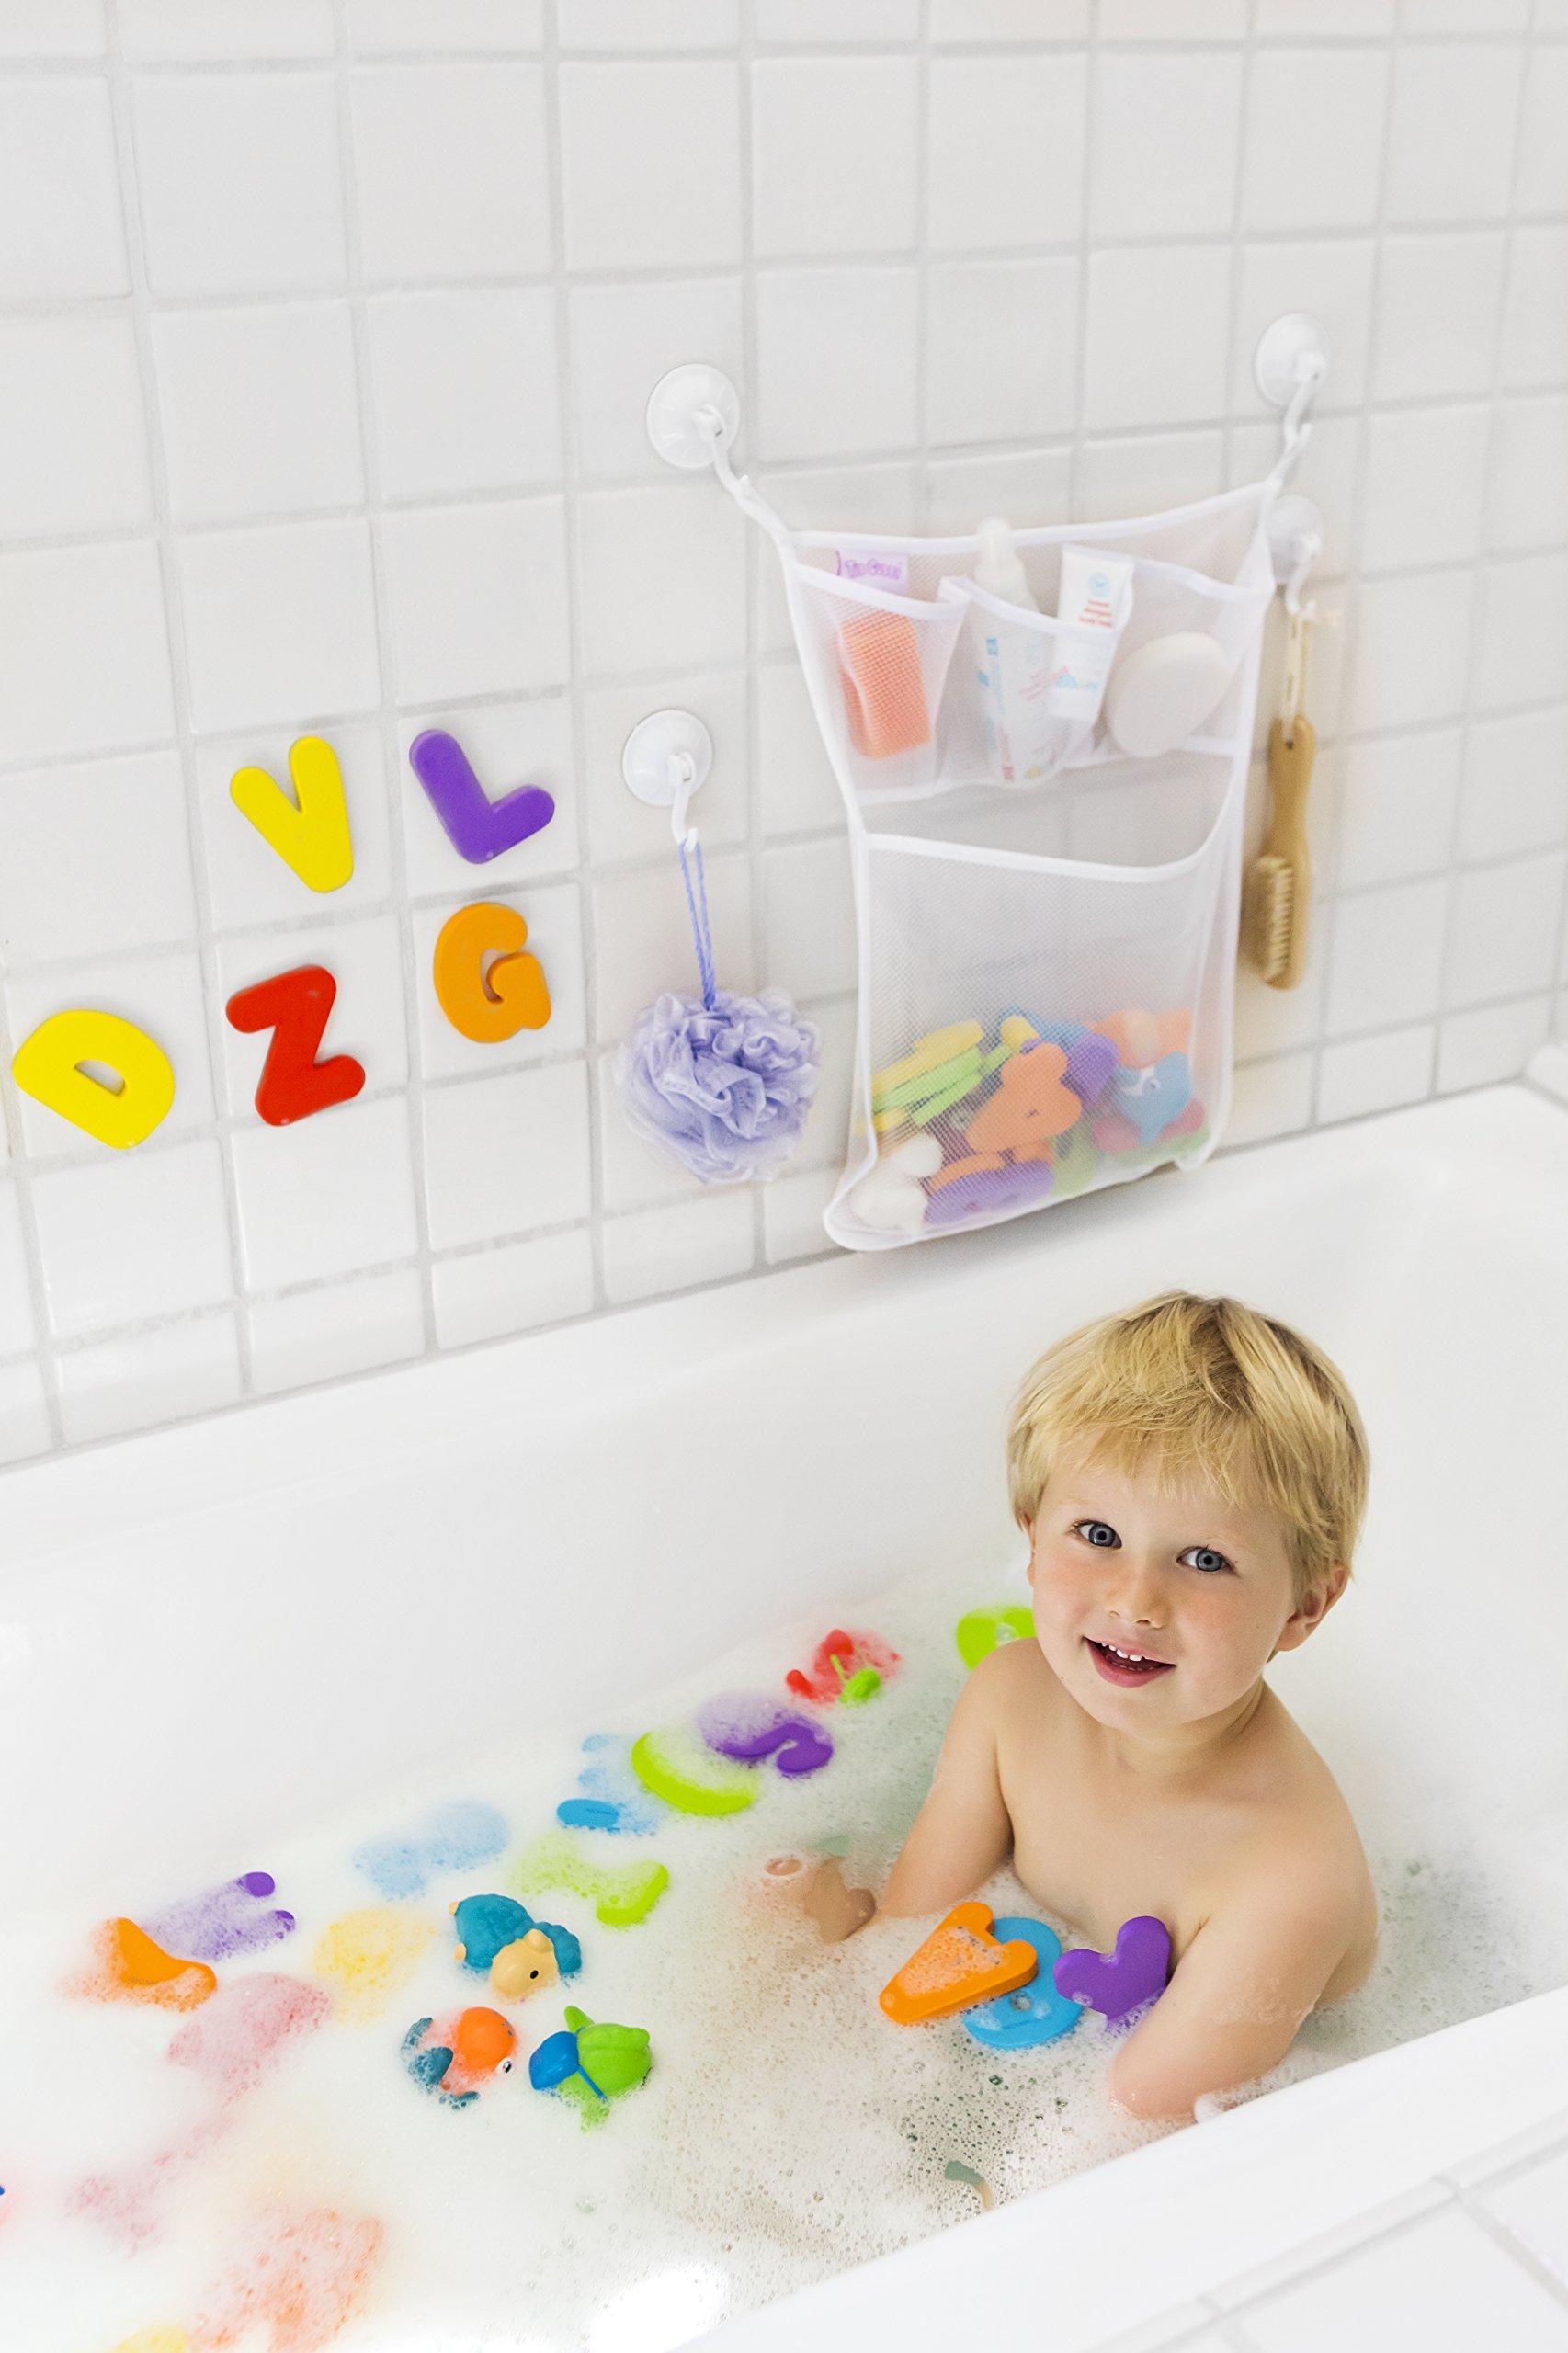 Famous Paint For Bathtub Small Bath Tub Paint Flat Bathtub Refinishers Paint Tub Young Painting Tub Fresh How To Paint Your Bathtub